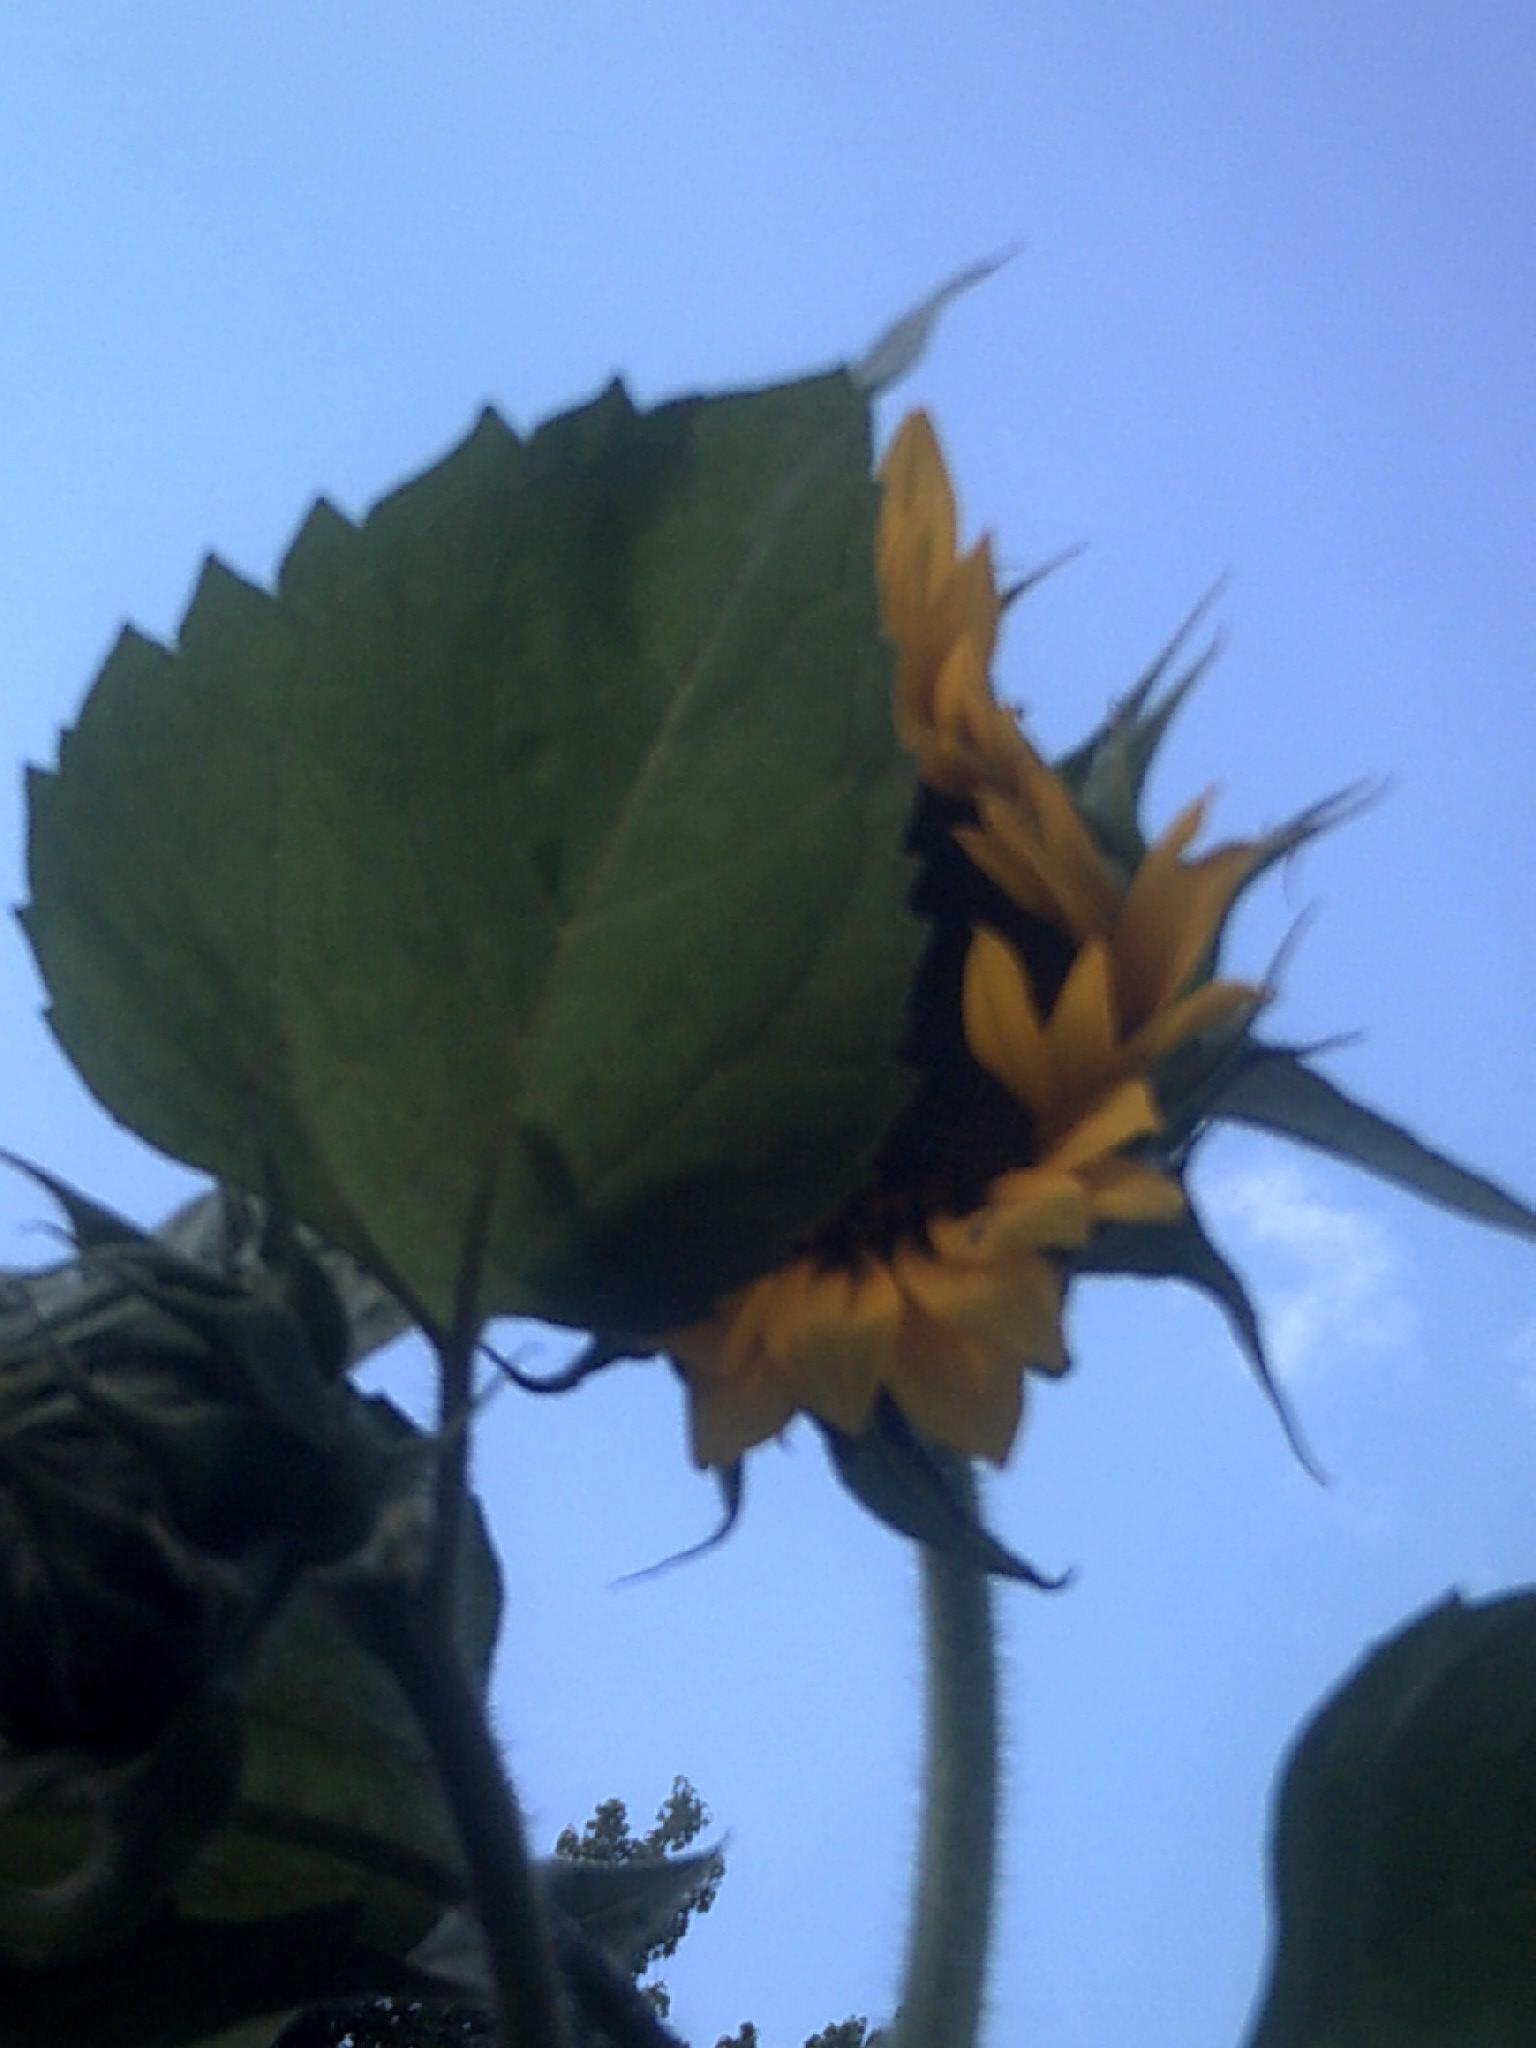 hiding from the sun by franki503